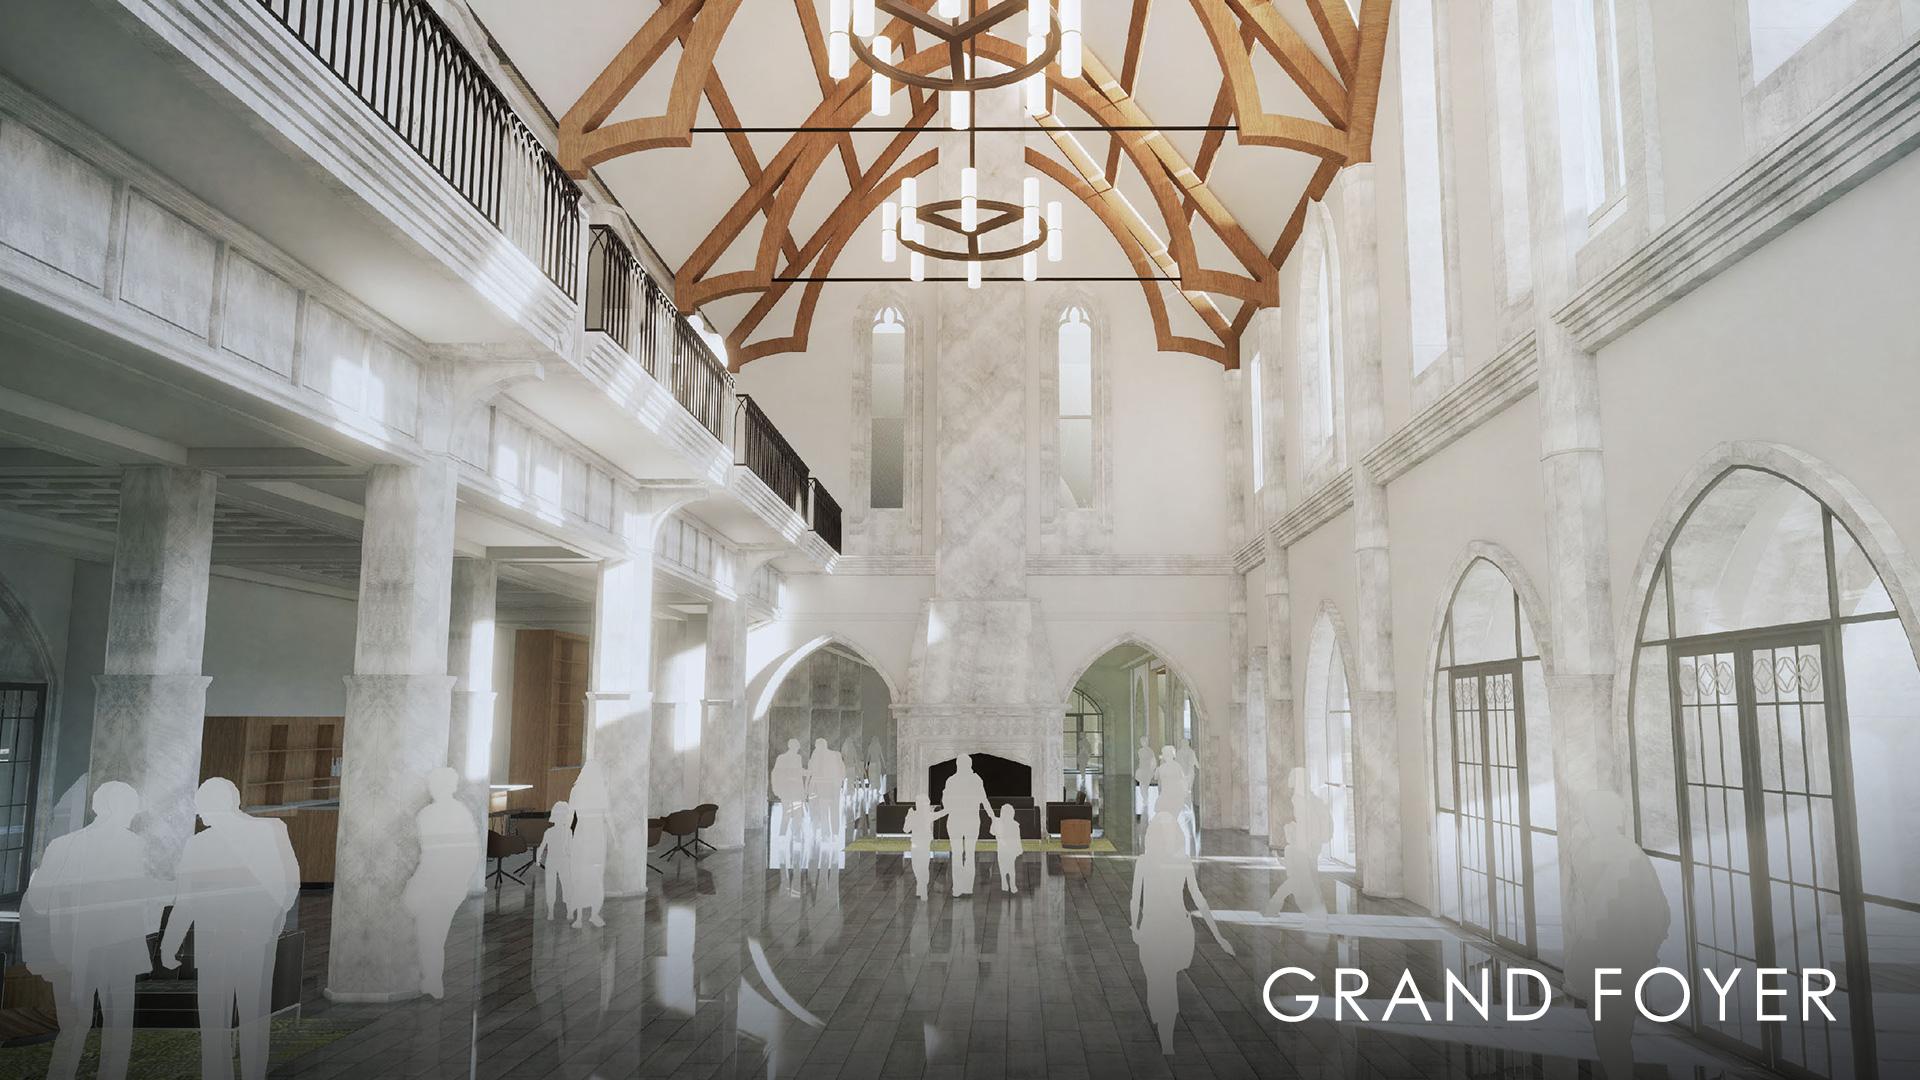 GrandFoyer-1920x1080.jpg